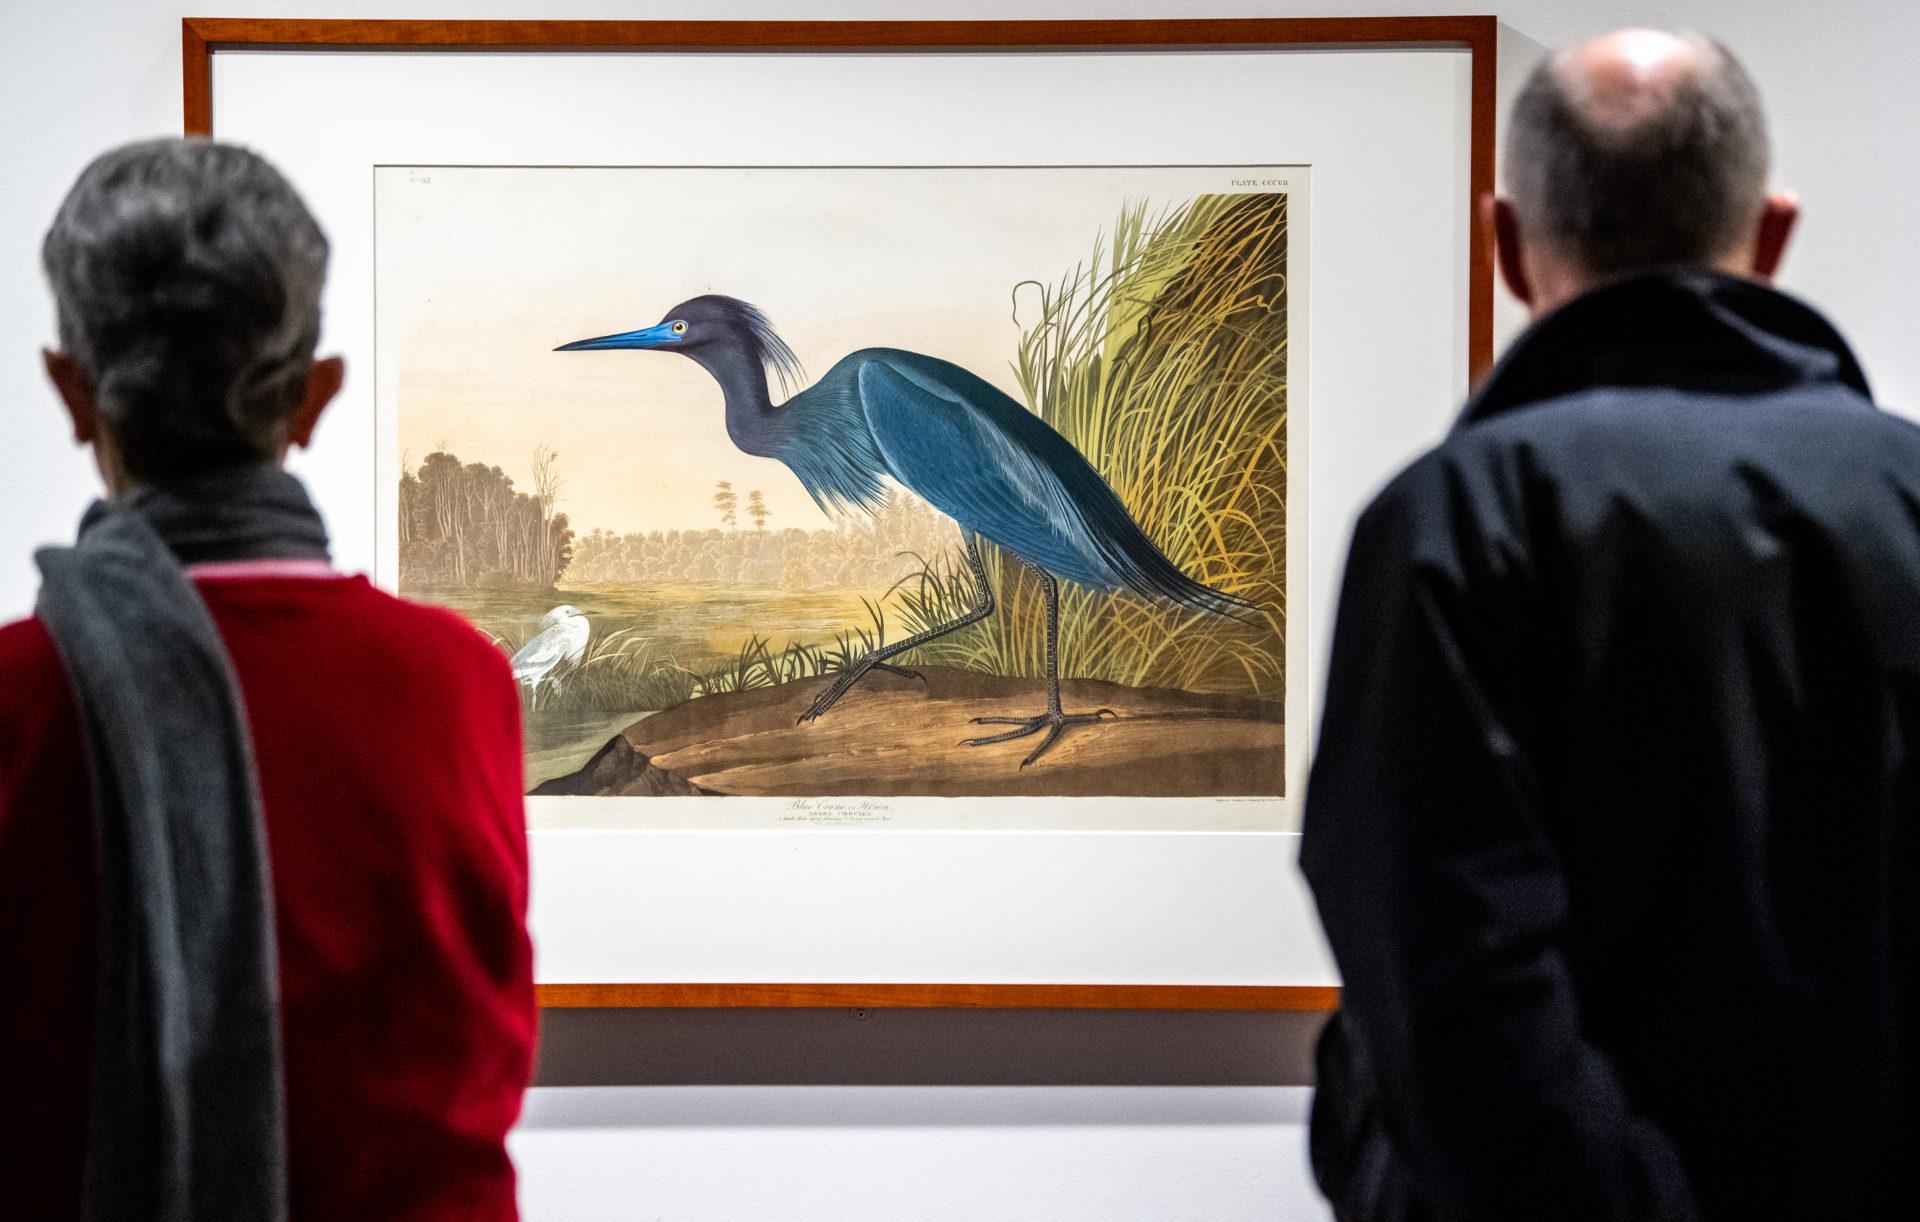 museum guests look at audubon plate of heron